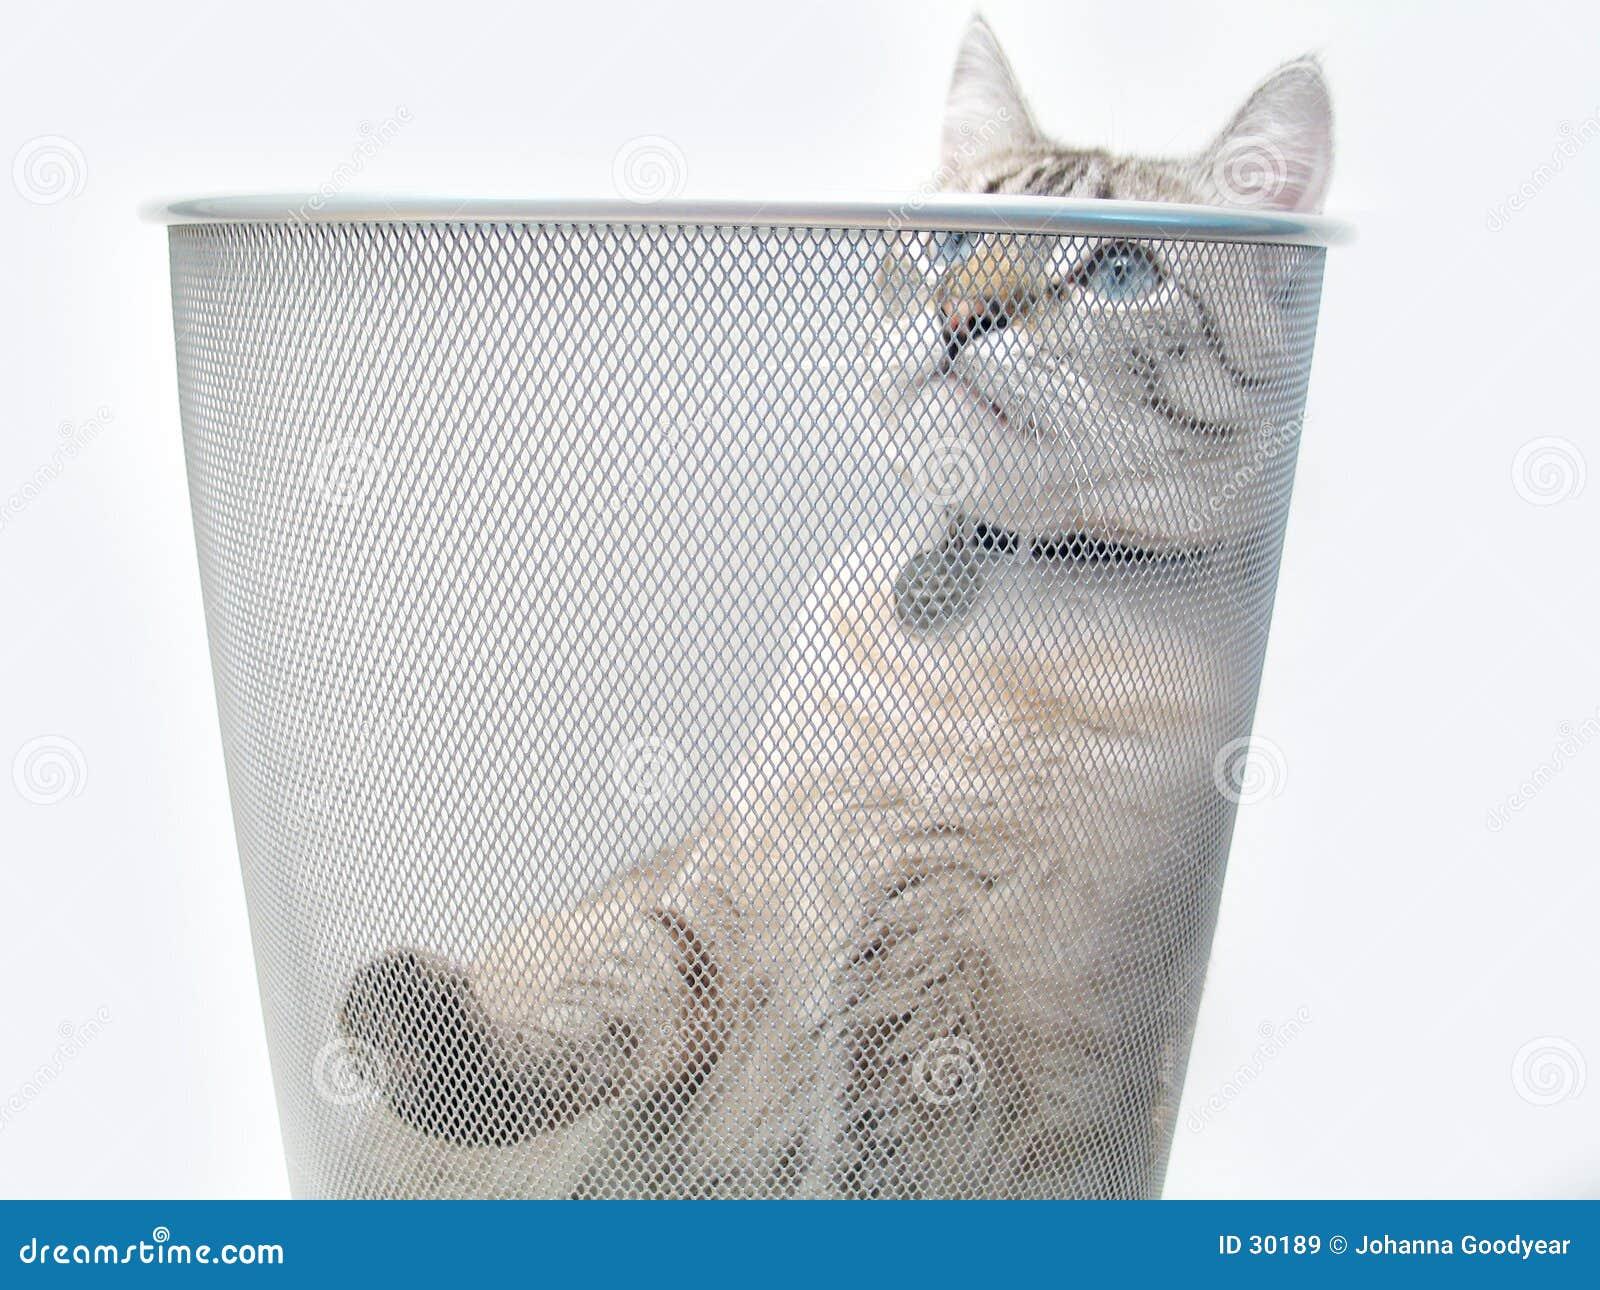 1 kattspelrum